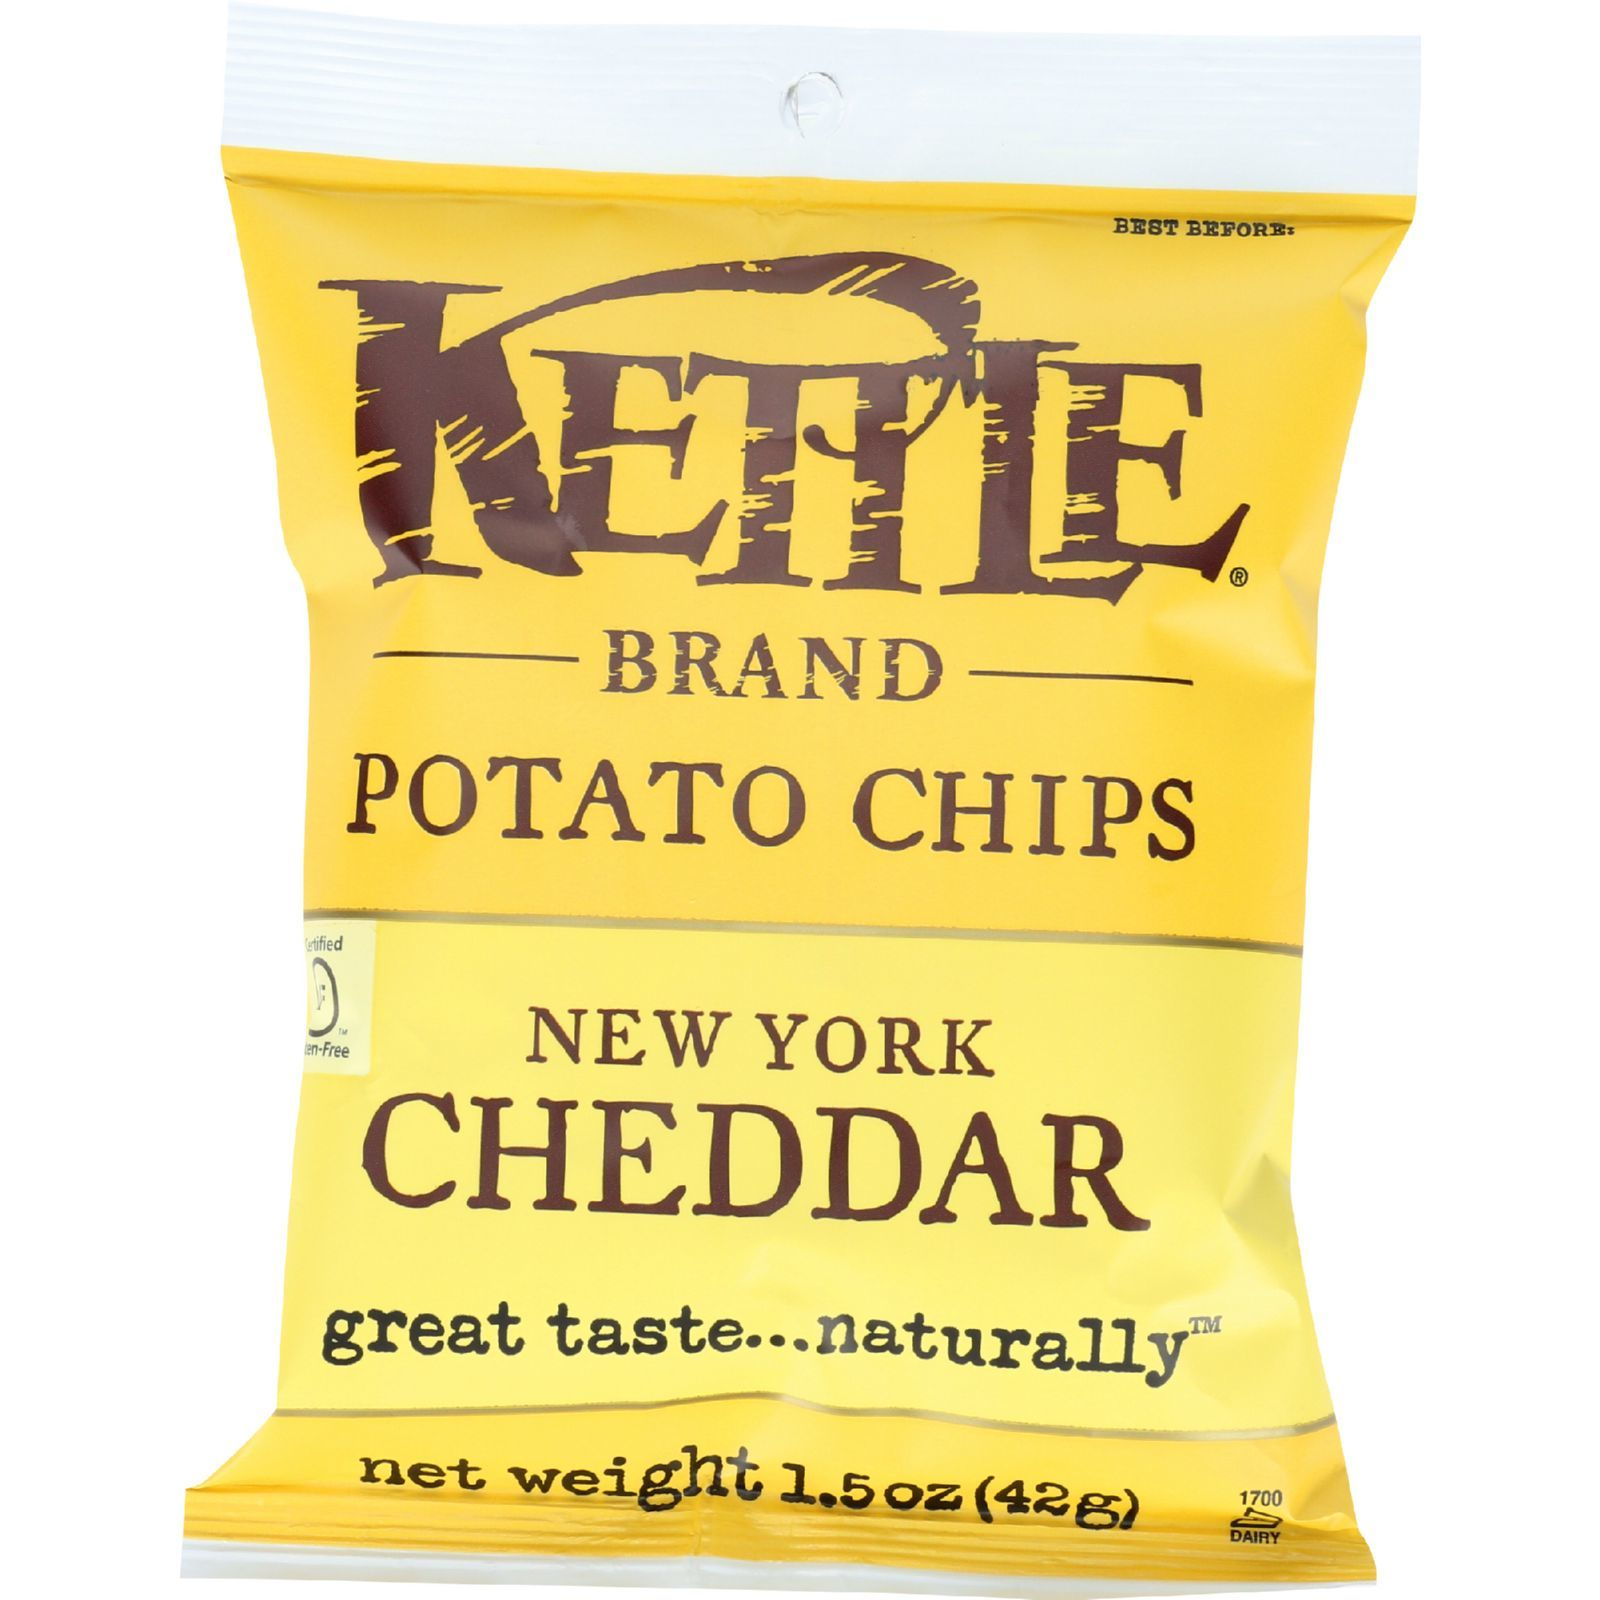 Kettle Brand Potato Chips - New York Cheddar - 1.5 oz - case of 24